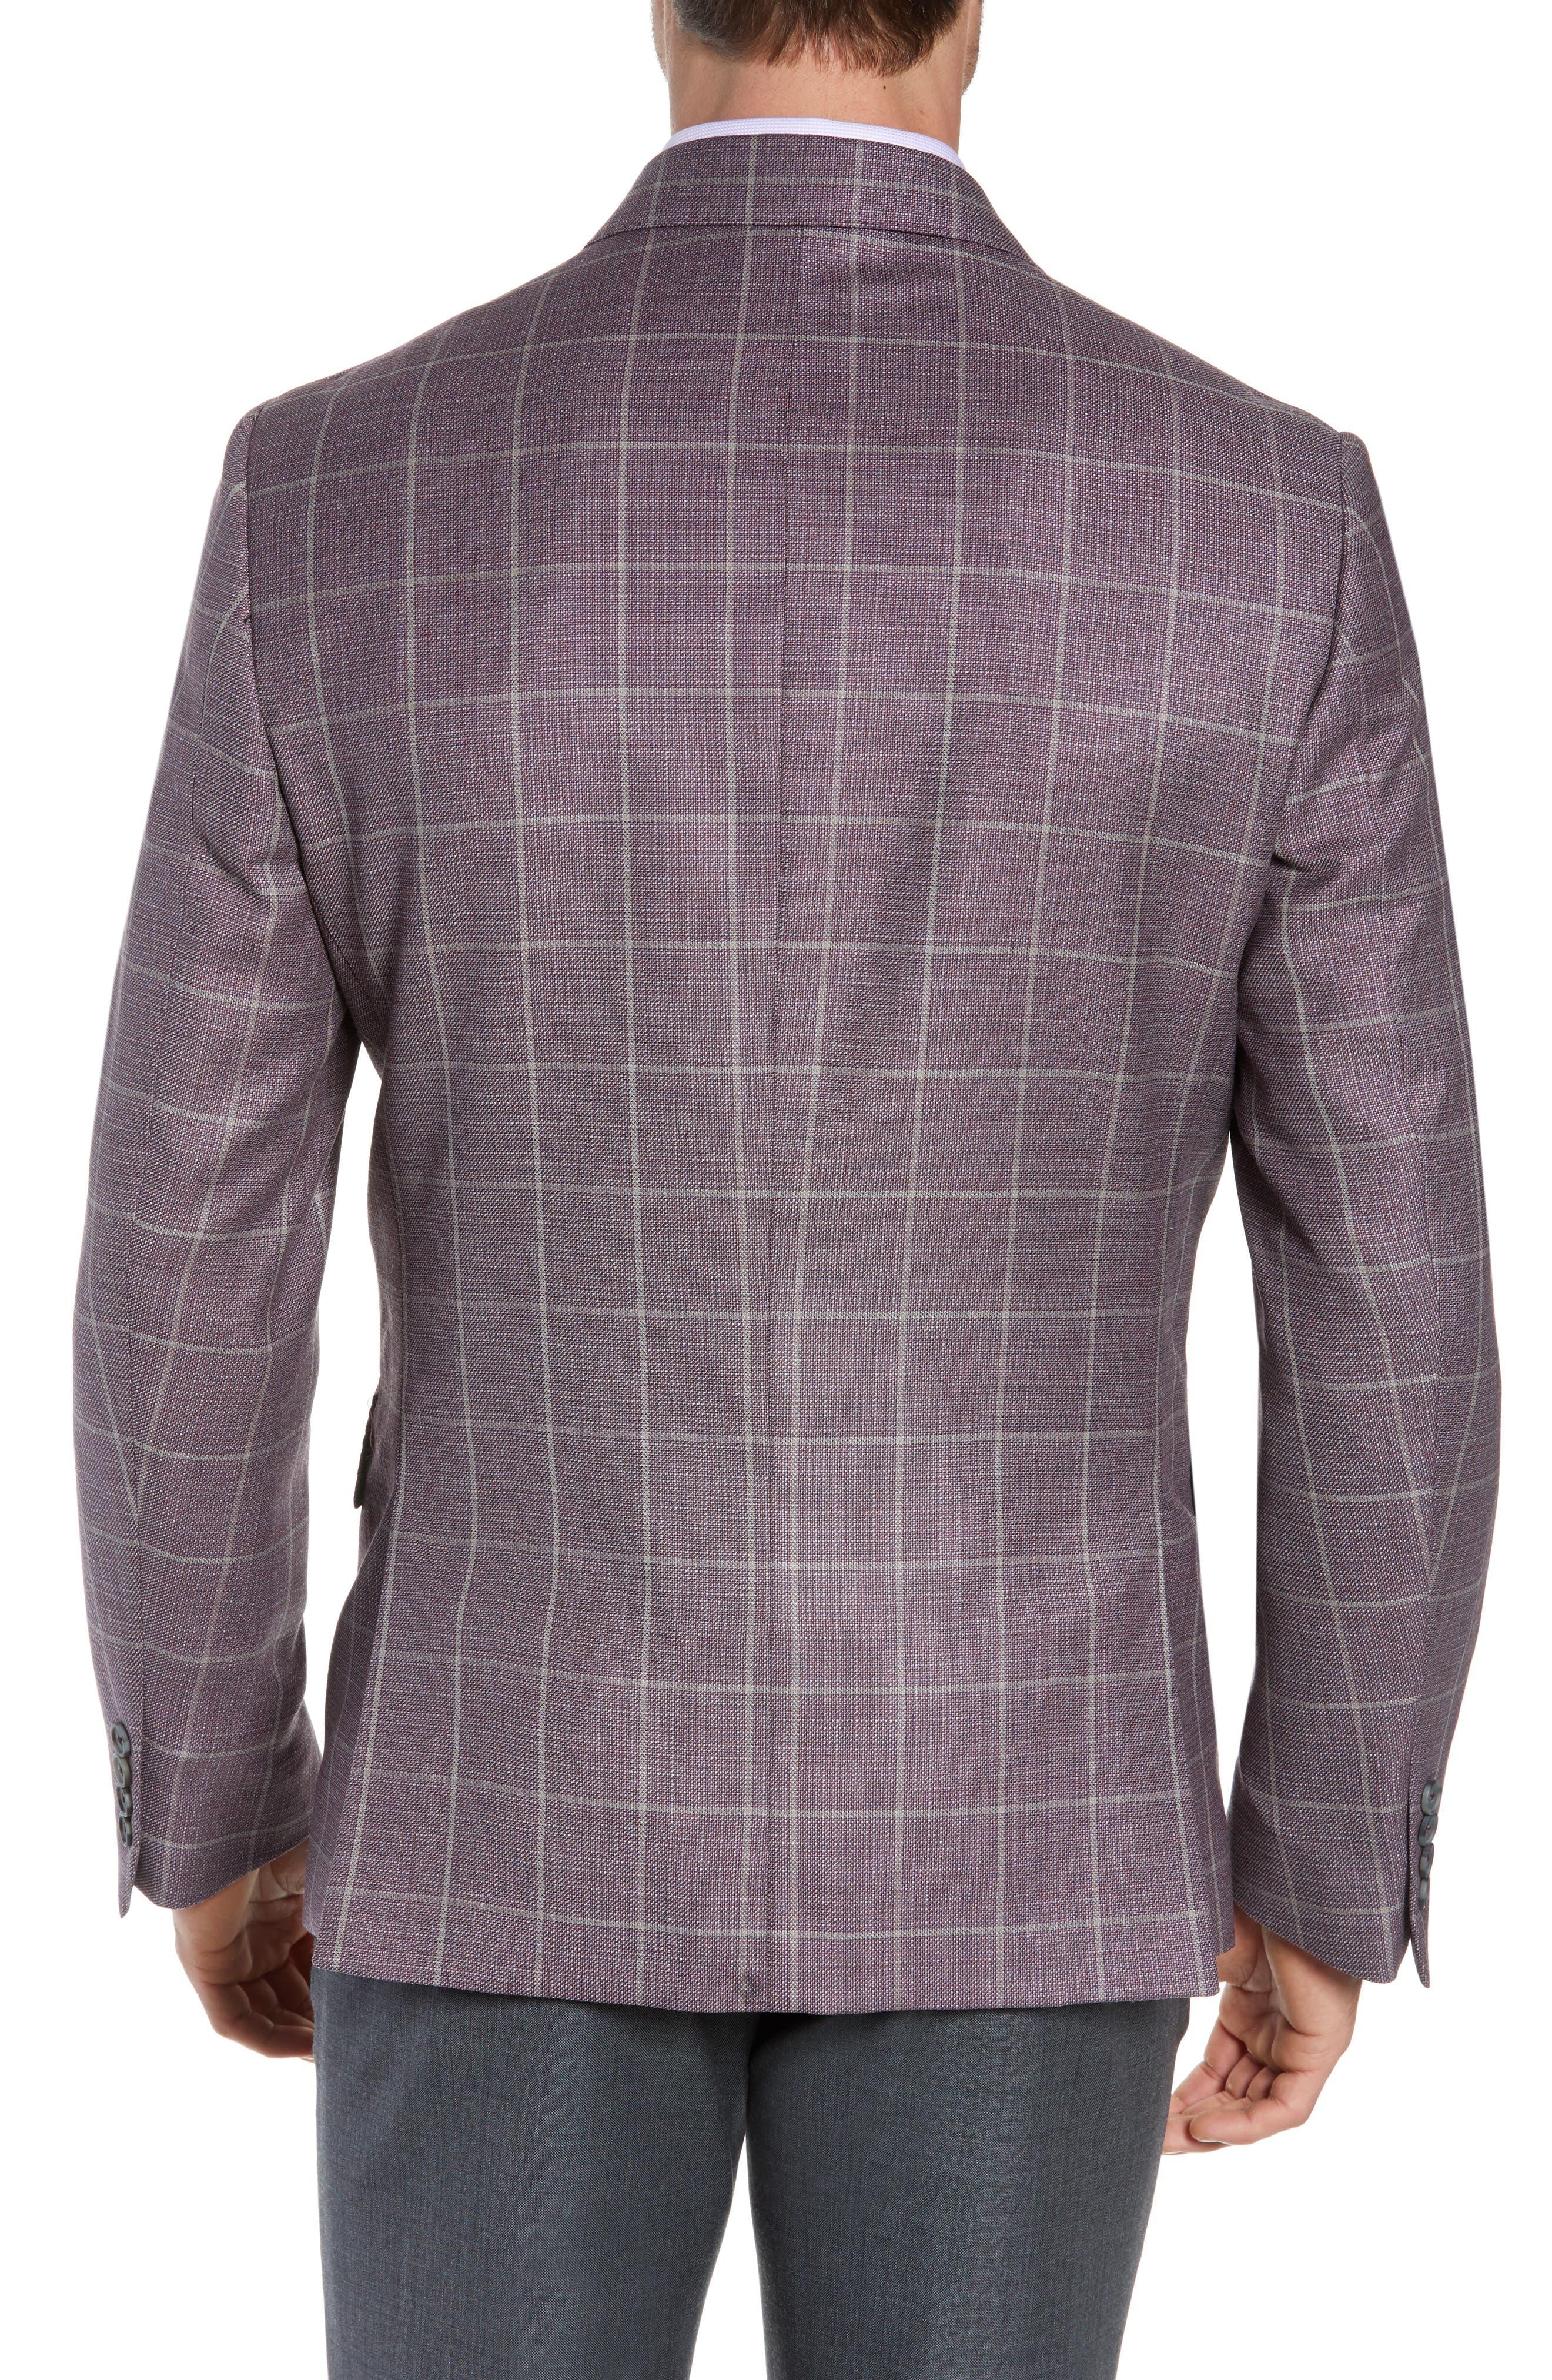 JOHN W. NORDSTROM<SUP>®</SUP>, Traditional Fit Windowpane Wool Sport Coat, Alternate thumbnail 2, color, BURGUNDY SASS WINDOWPANE